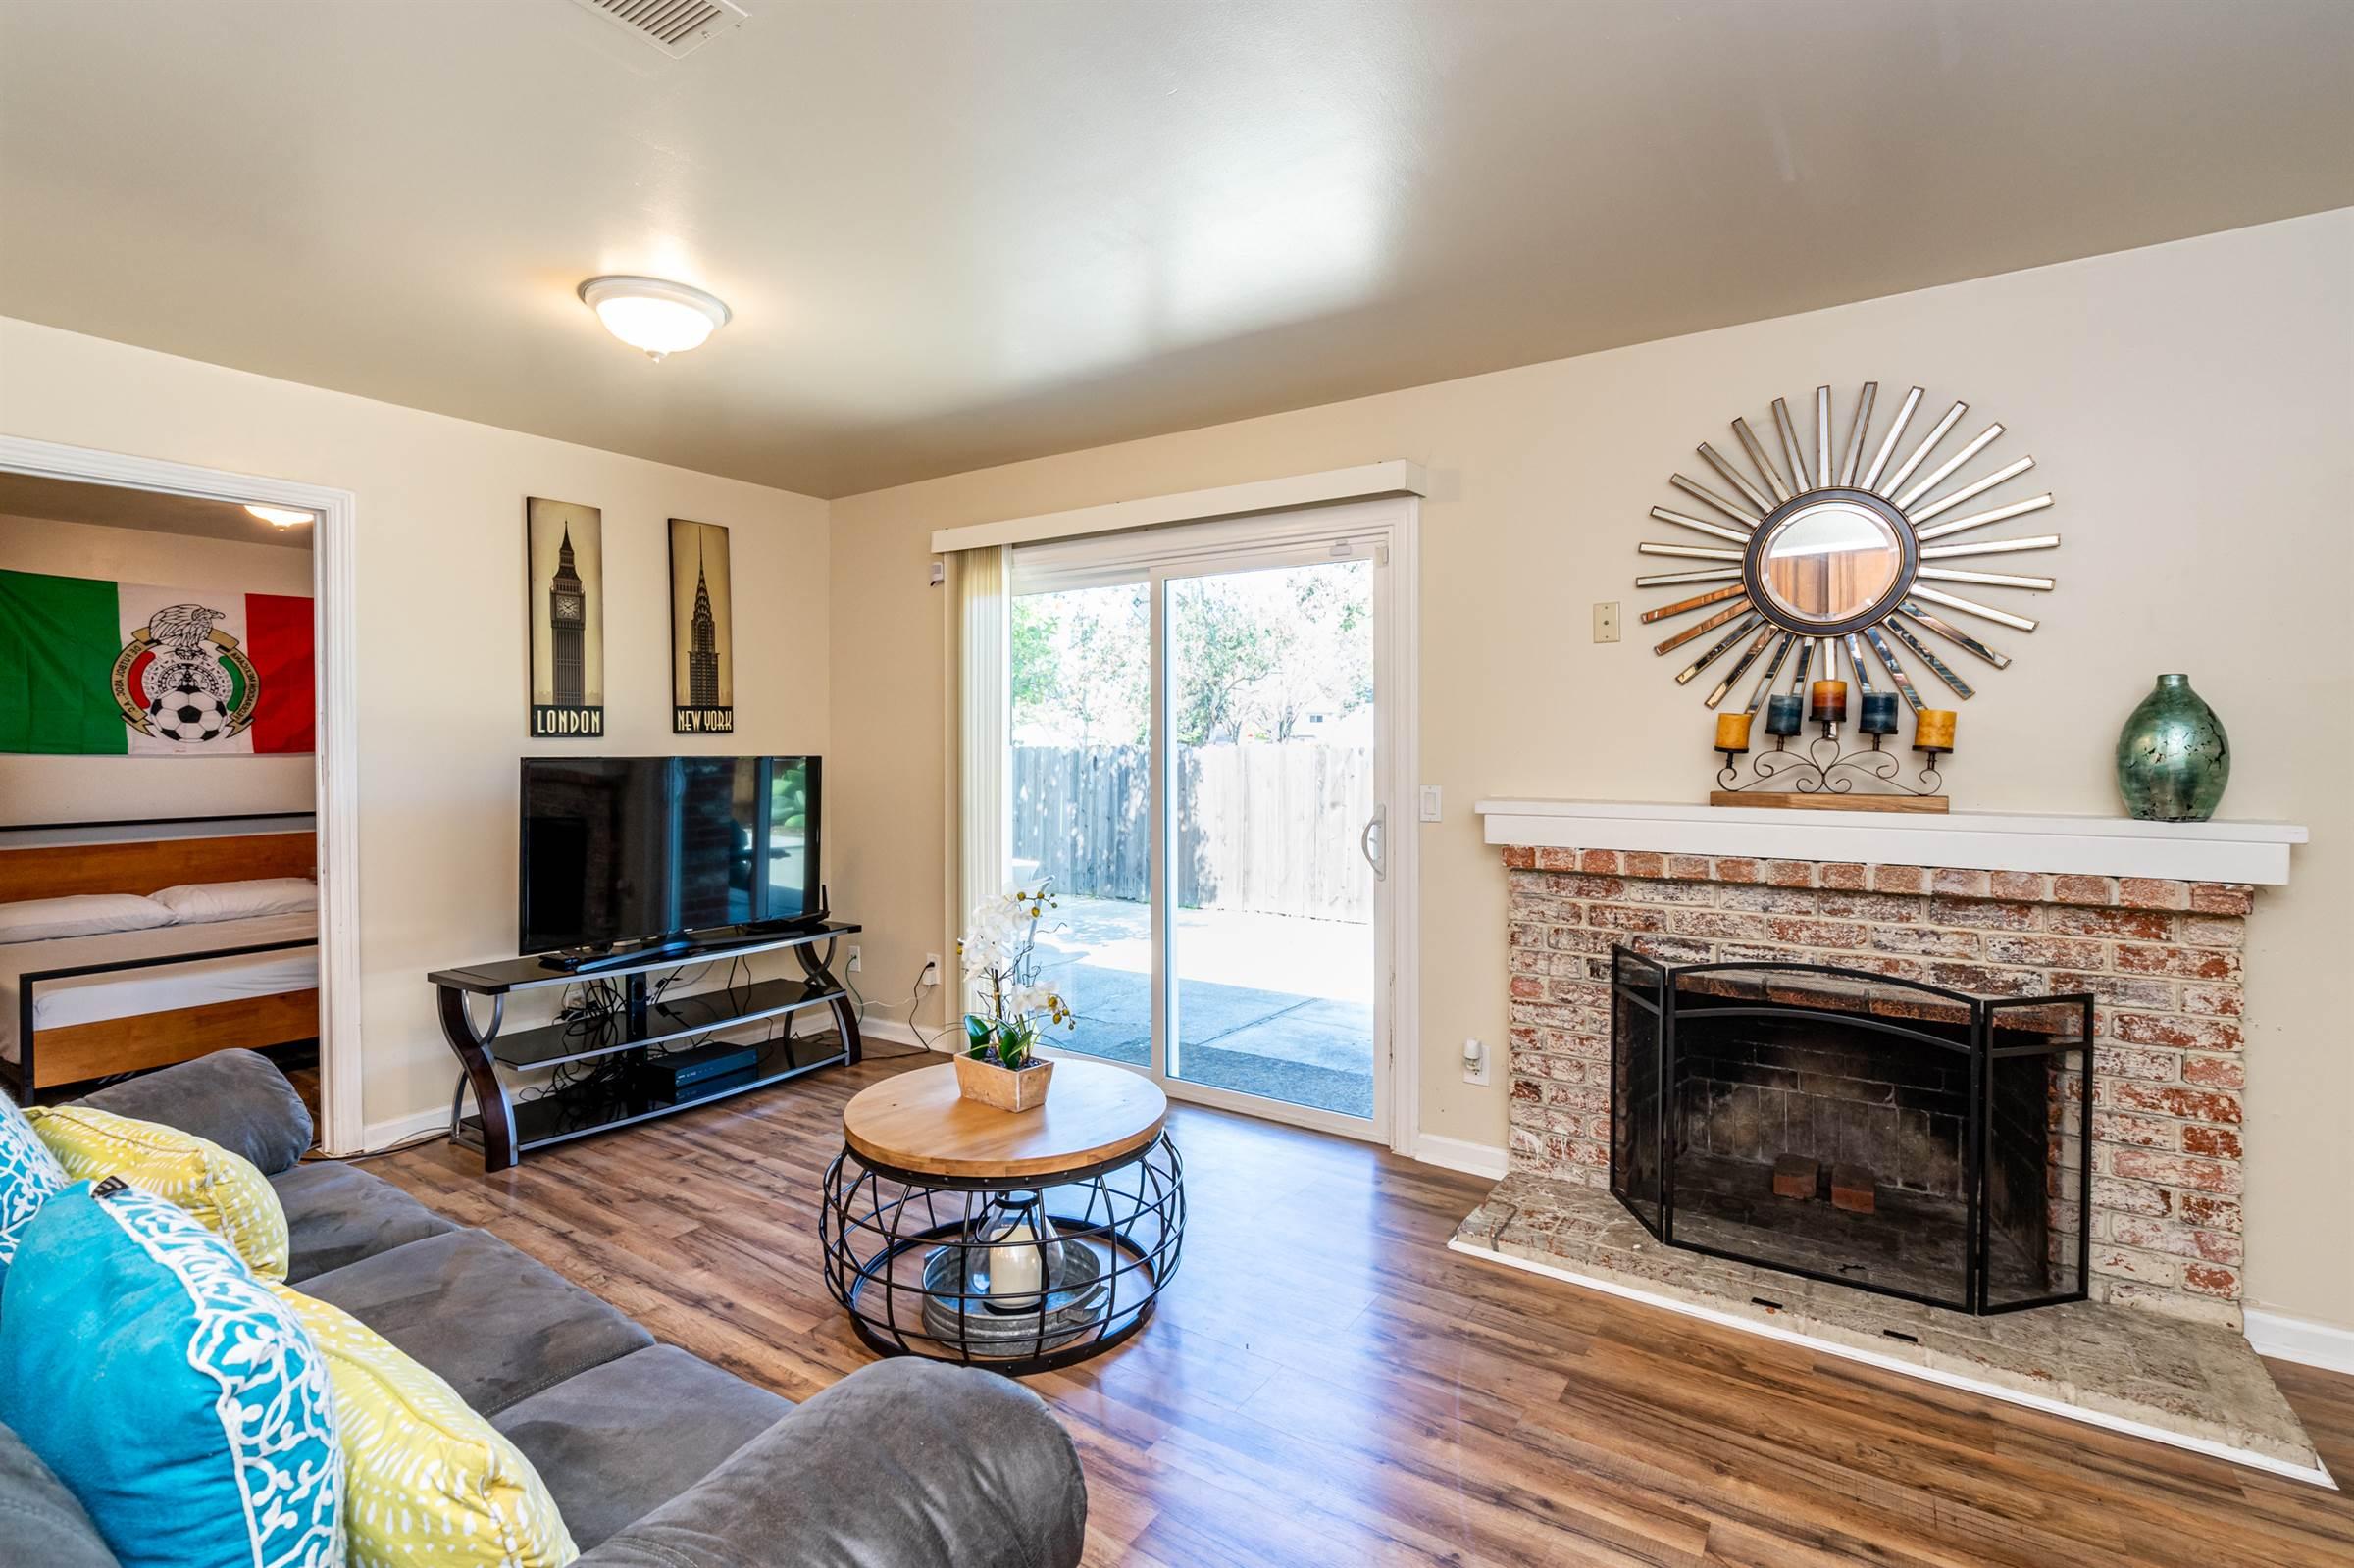 754 Nightingale Drive, Fairfield, CA 94533